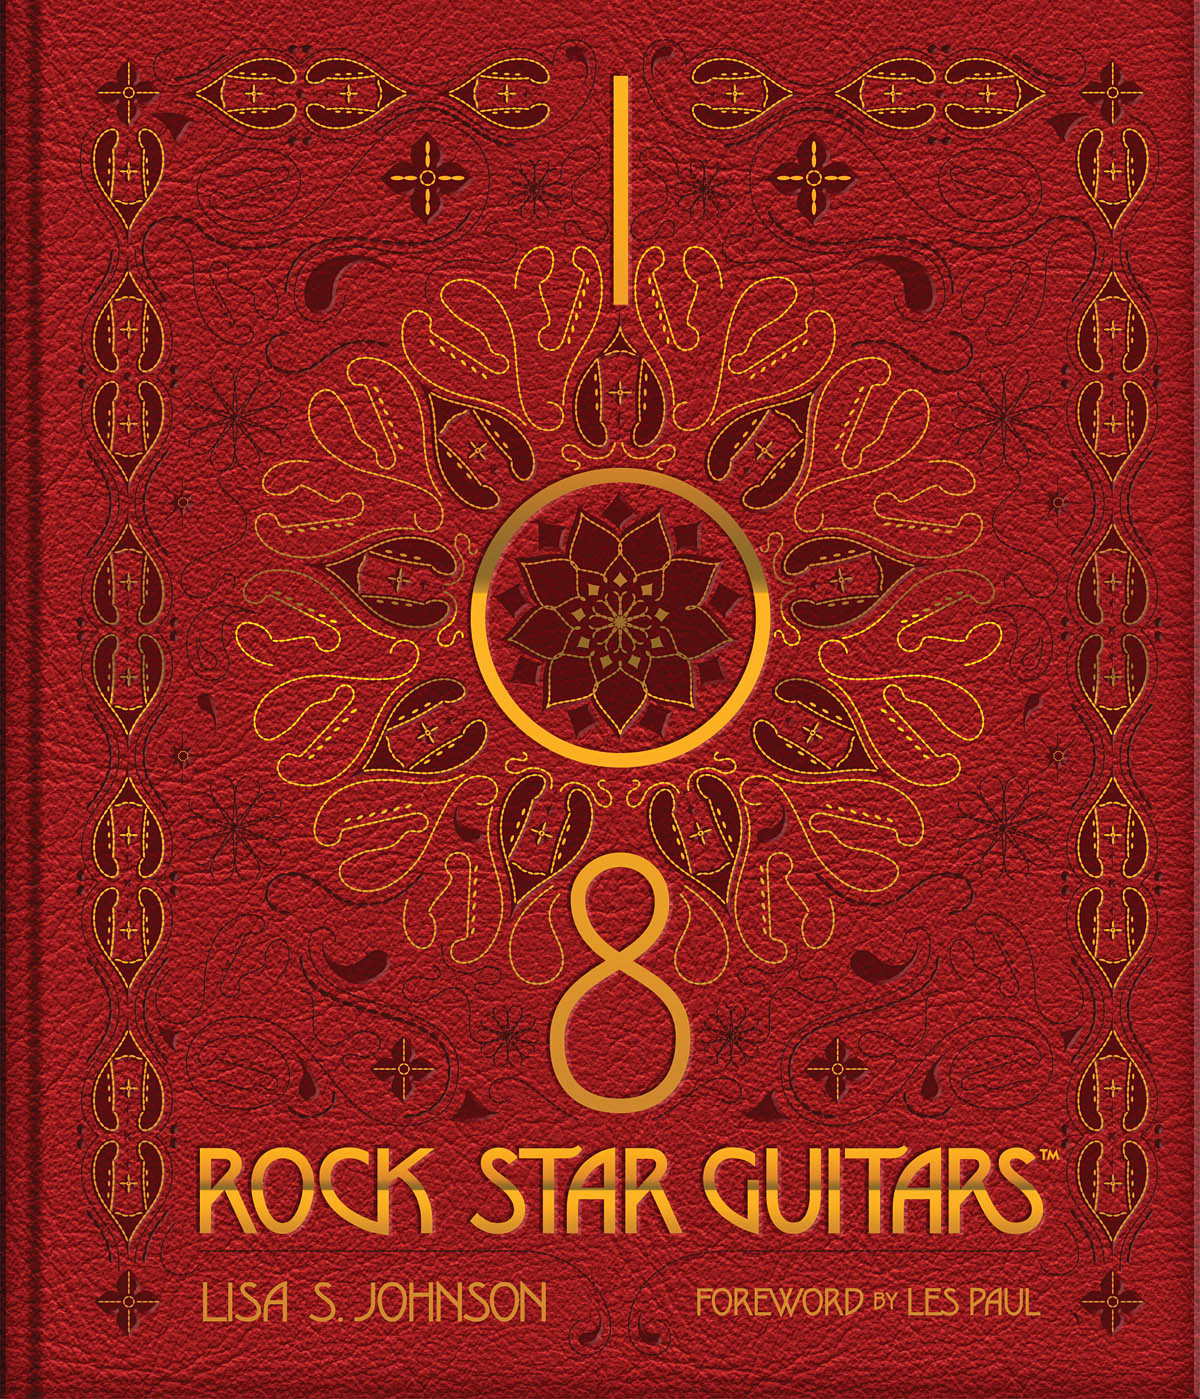 guitar books Onstage Backstage